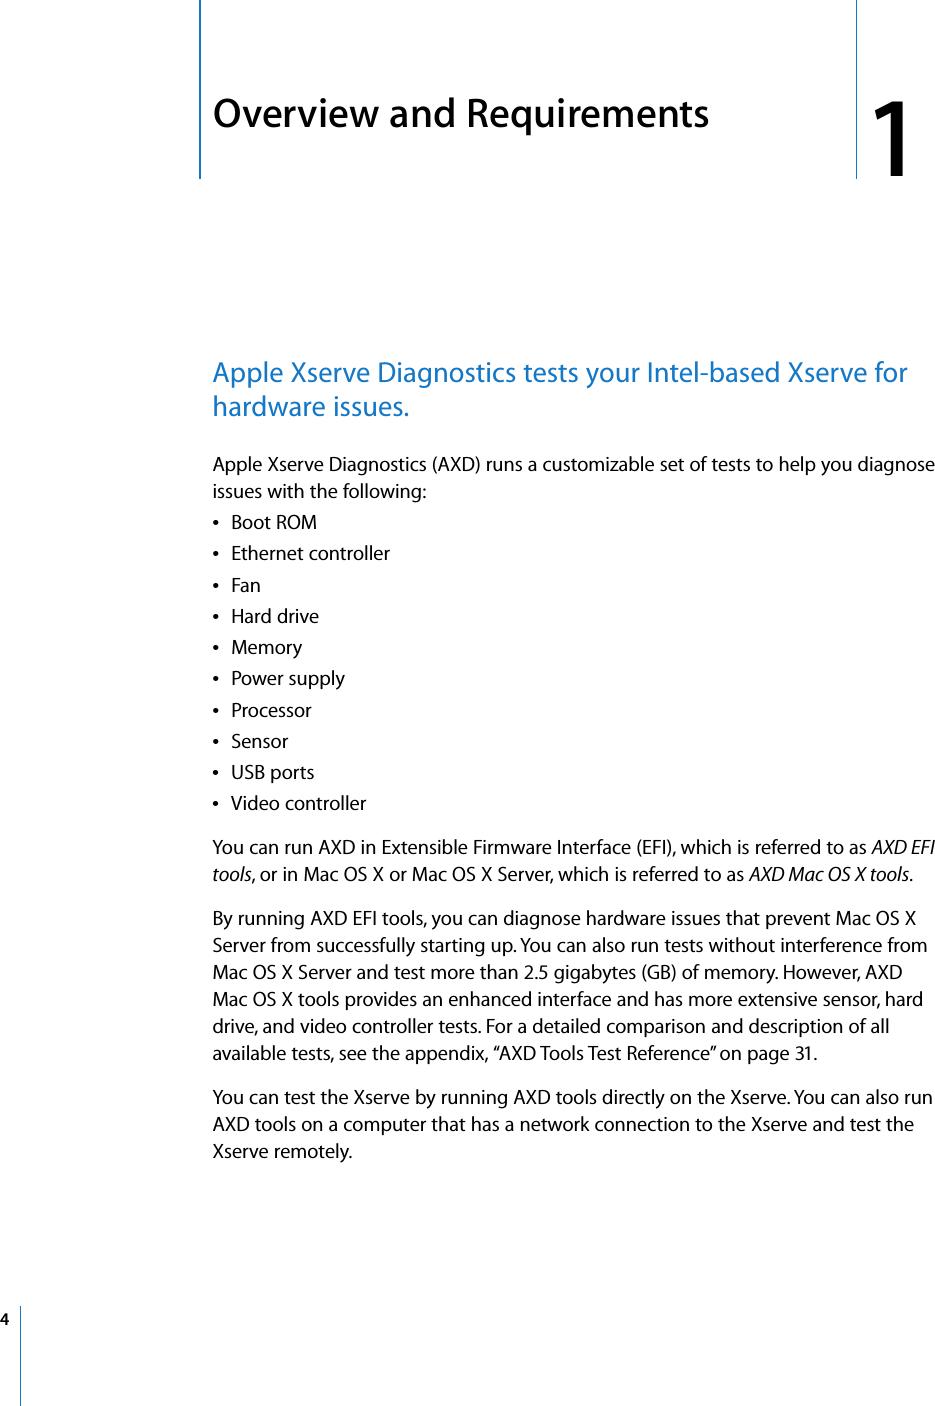 Apple Xserve (Late 2006) Diagnostics User's Guide User